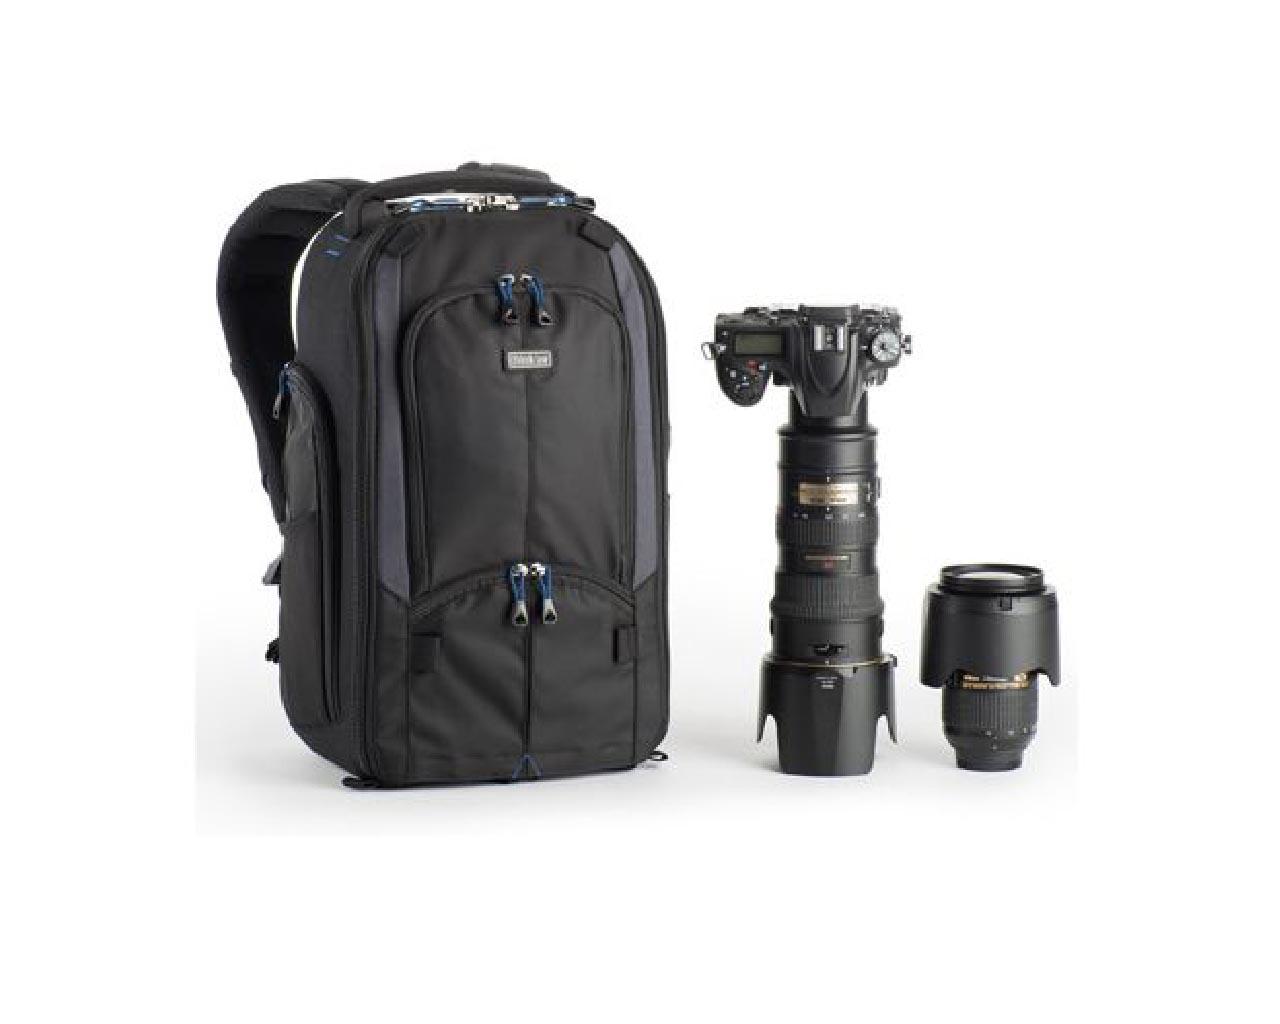 Profoto Accesorios Fotográficos | Master Class Photographers